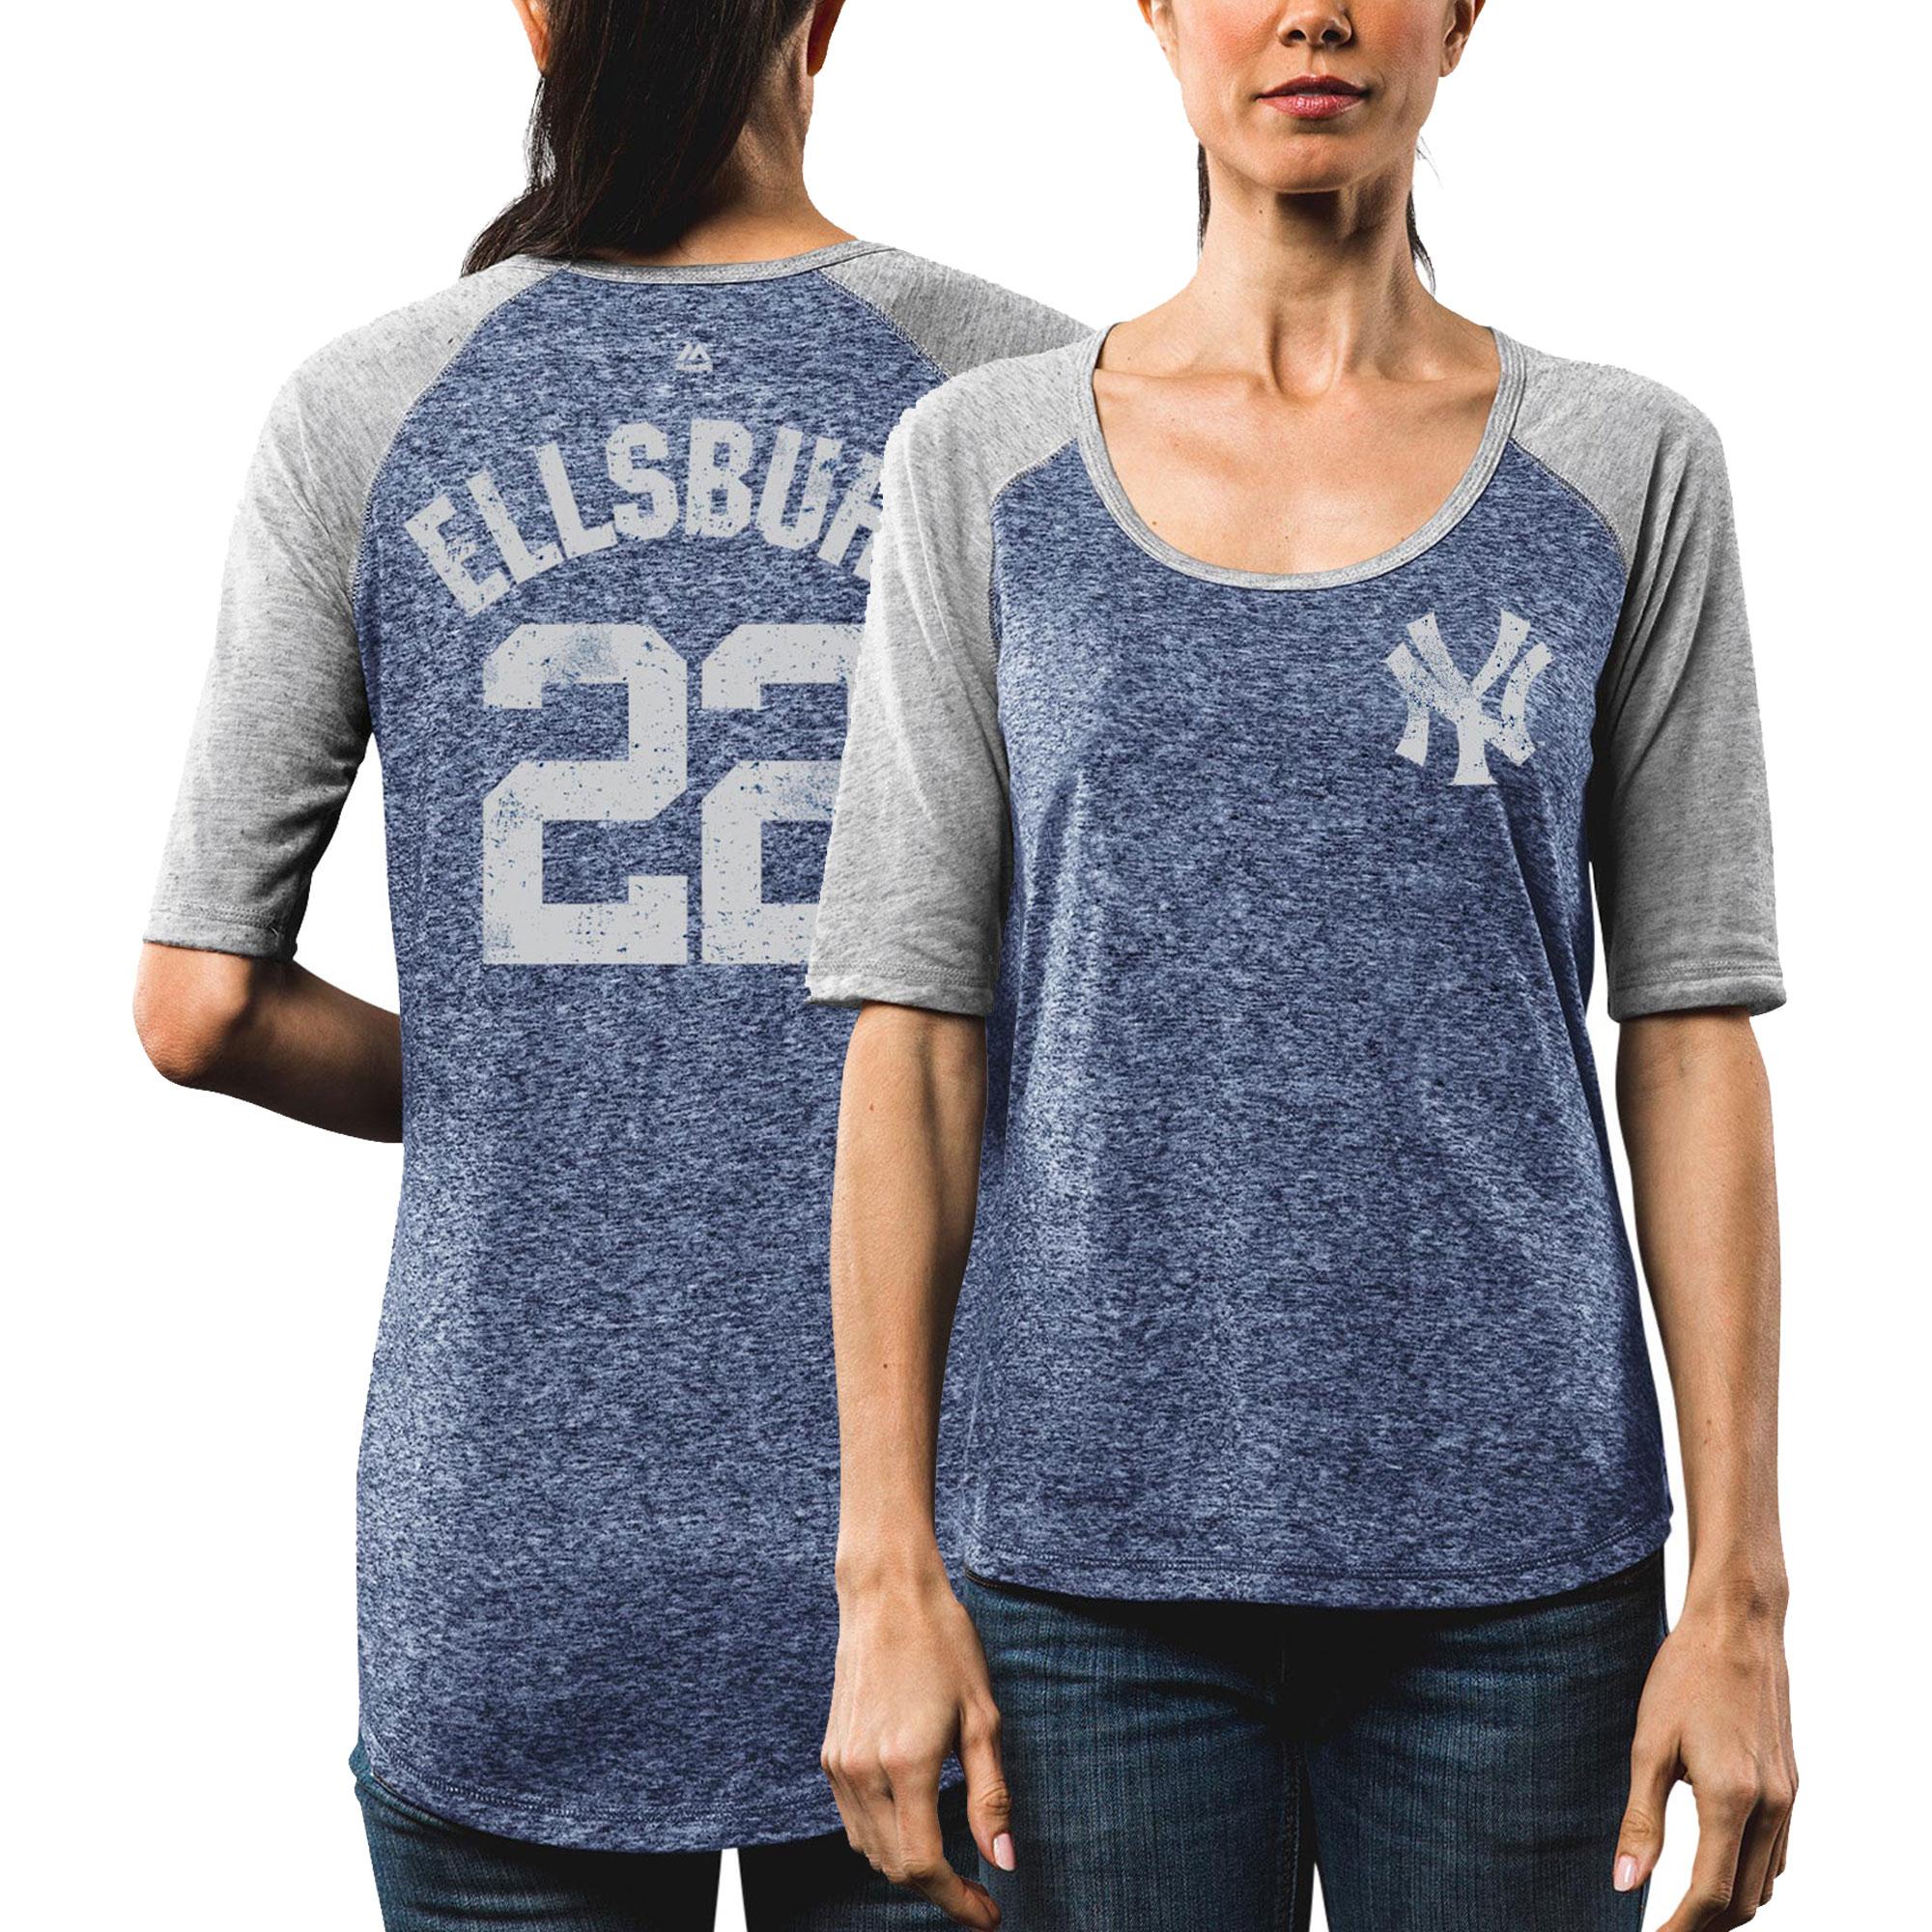 Jacoby Ellsbury New York Yankees Majestic Women's Victory Player Half-Sleeve T-Shirt - Navy/Gray